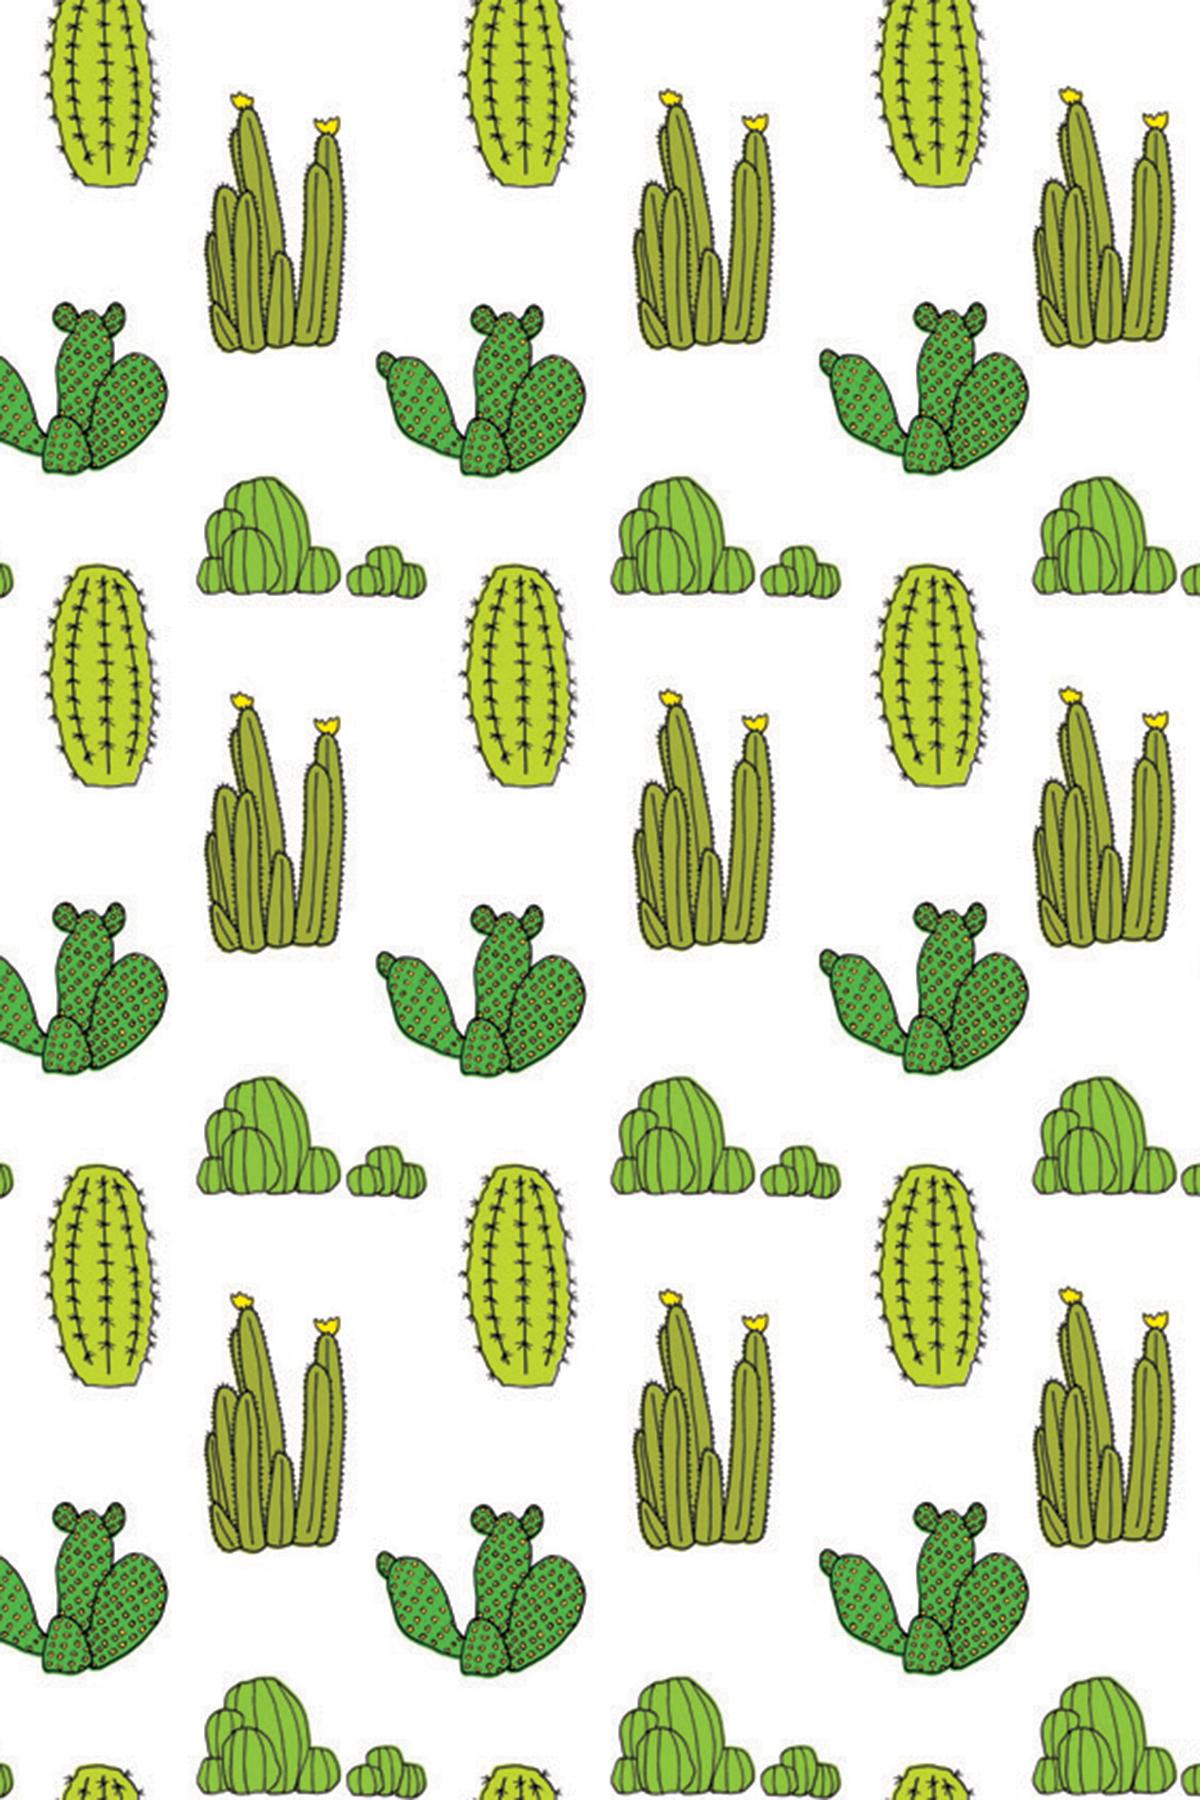 Unduh 770+ Wallpaper Tumblr Cactus Foto HD Paling Keren